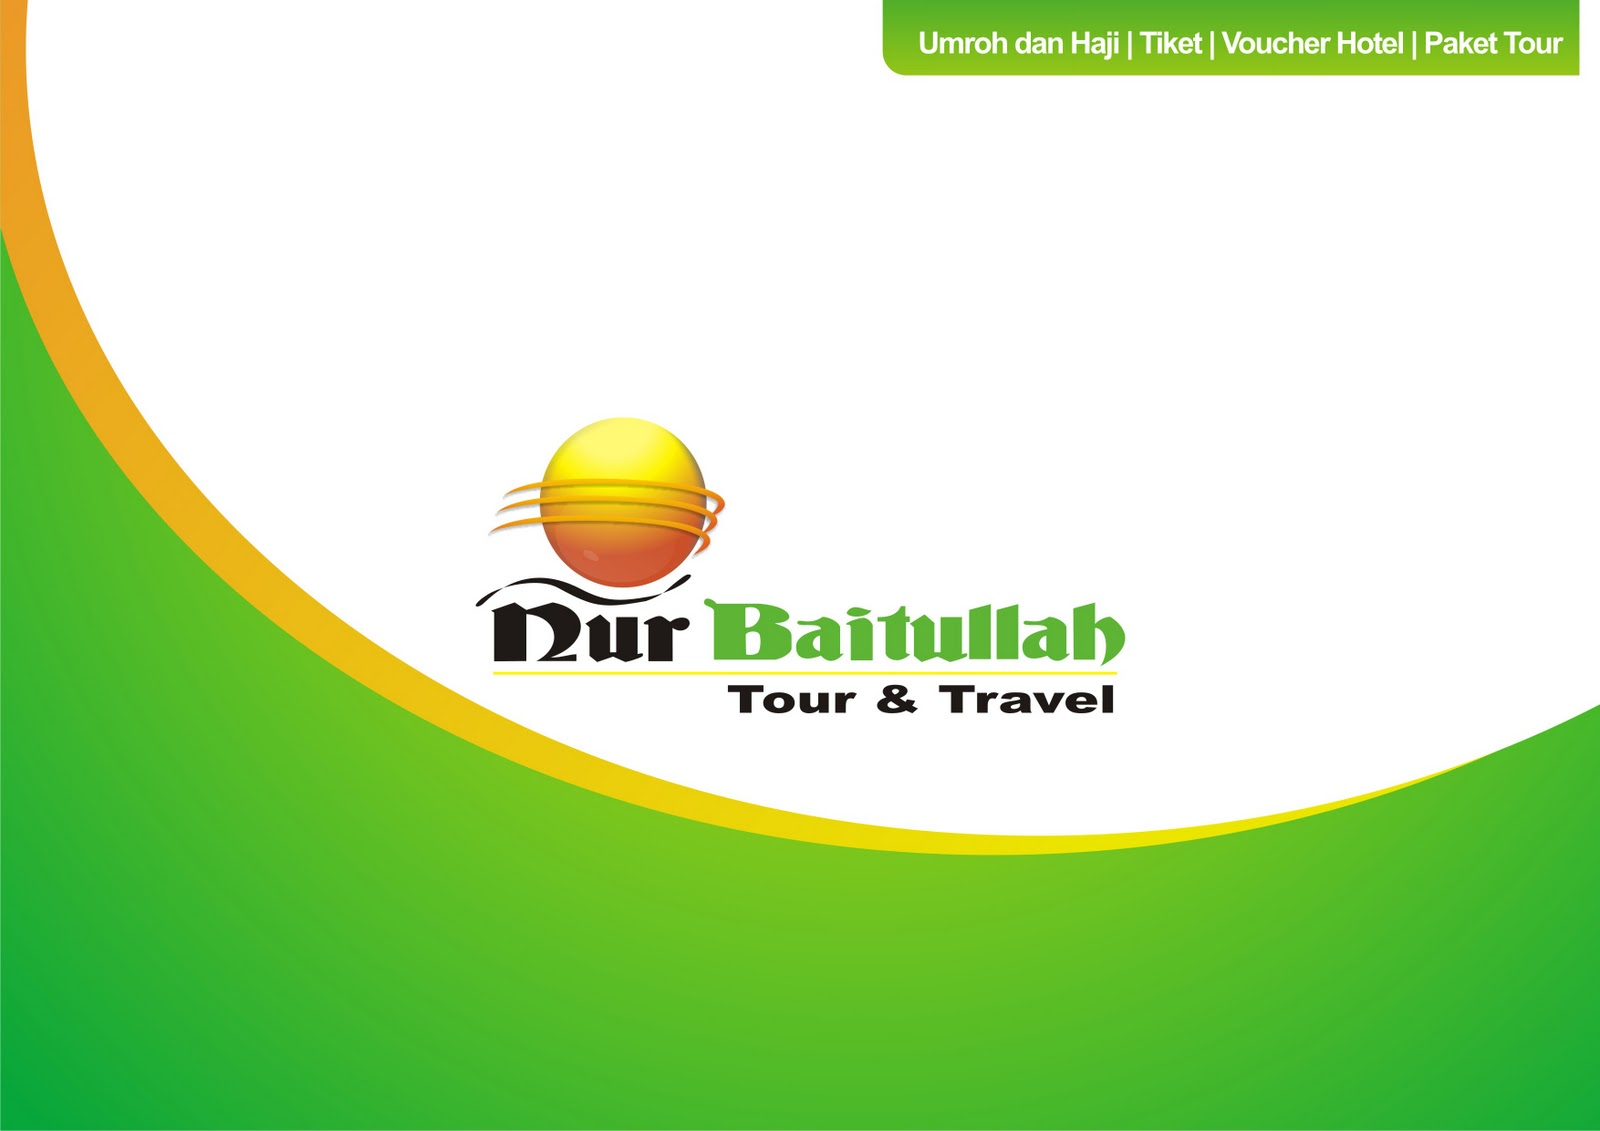 Contoh Company Profile Cetak Perusahaan Tour & Travel